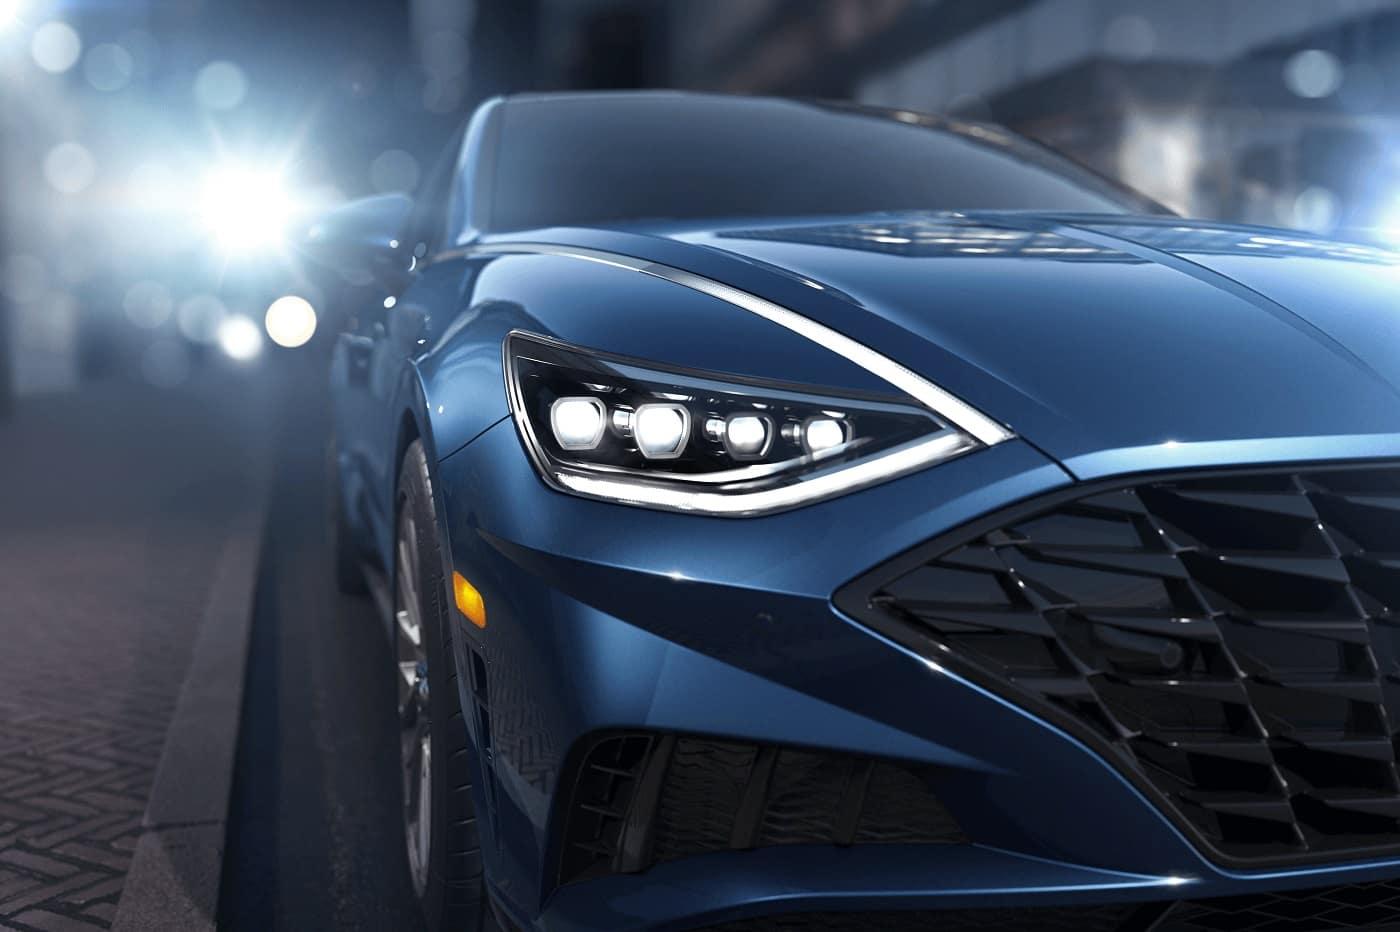 Hyundai Sonata Reviews Littleton CO | McDonald Hyundai